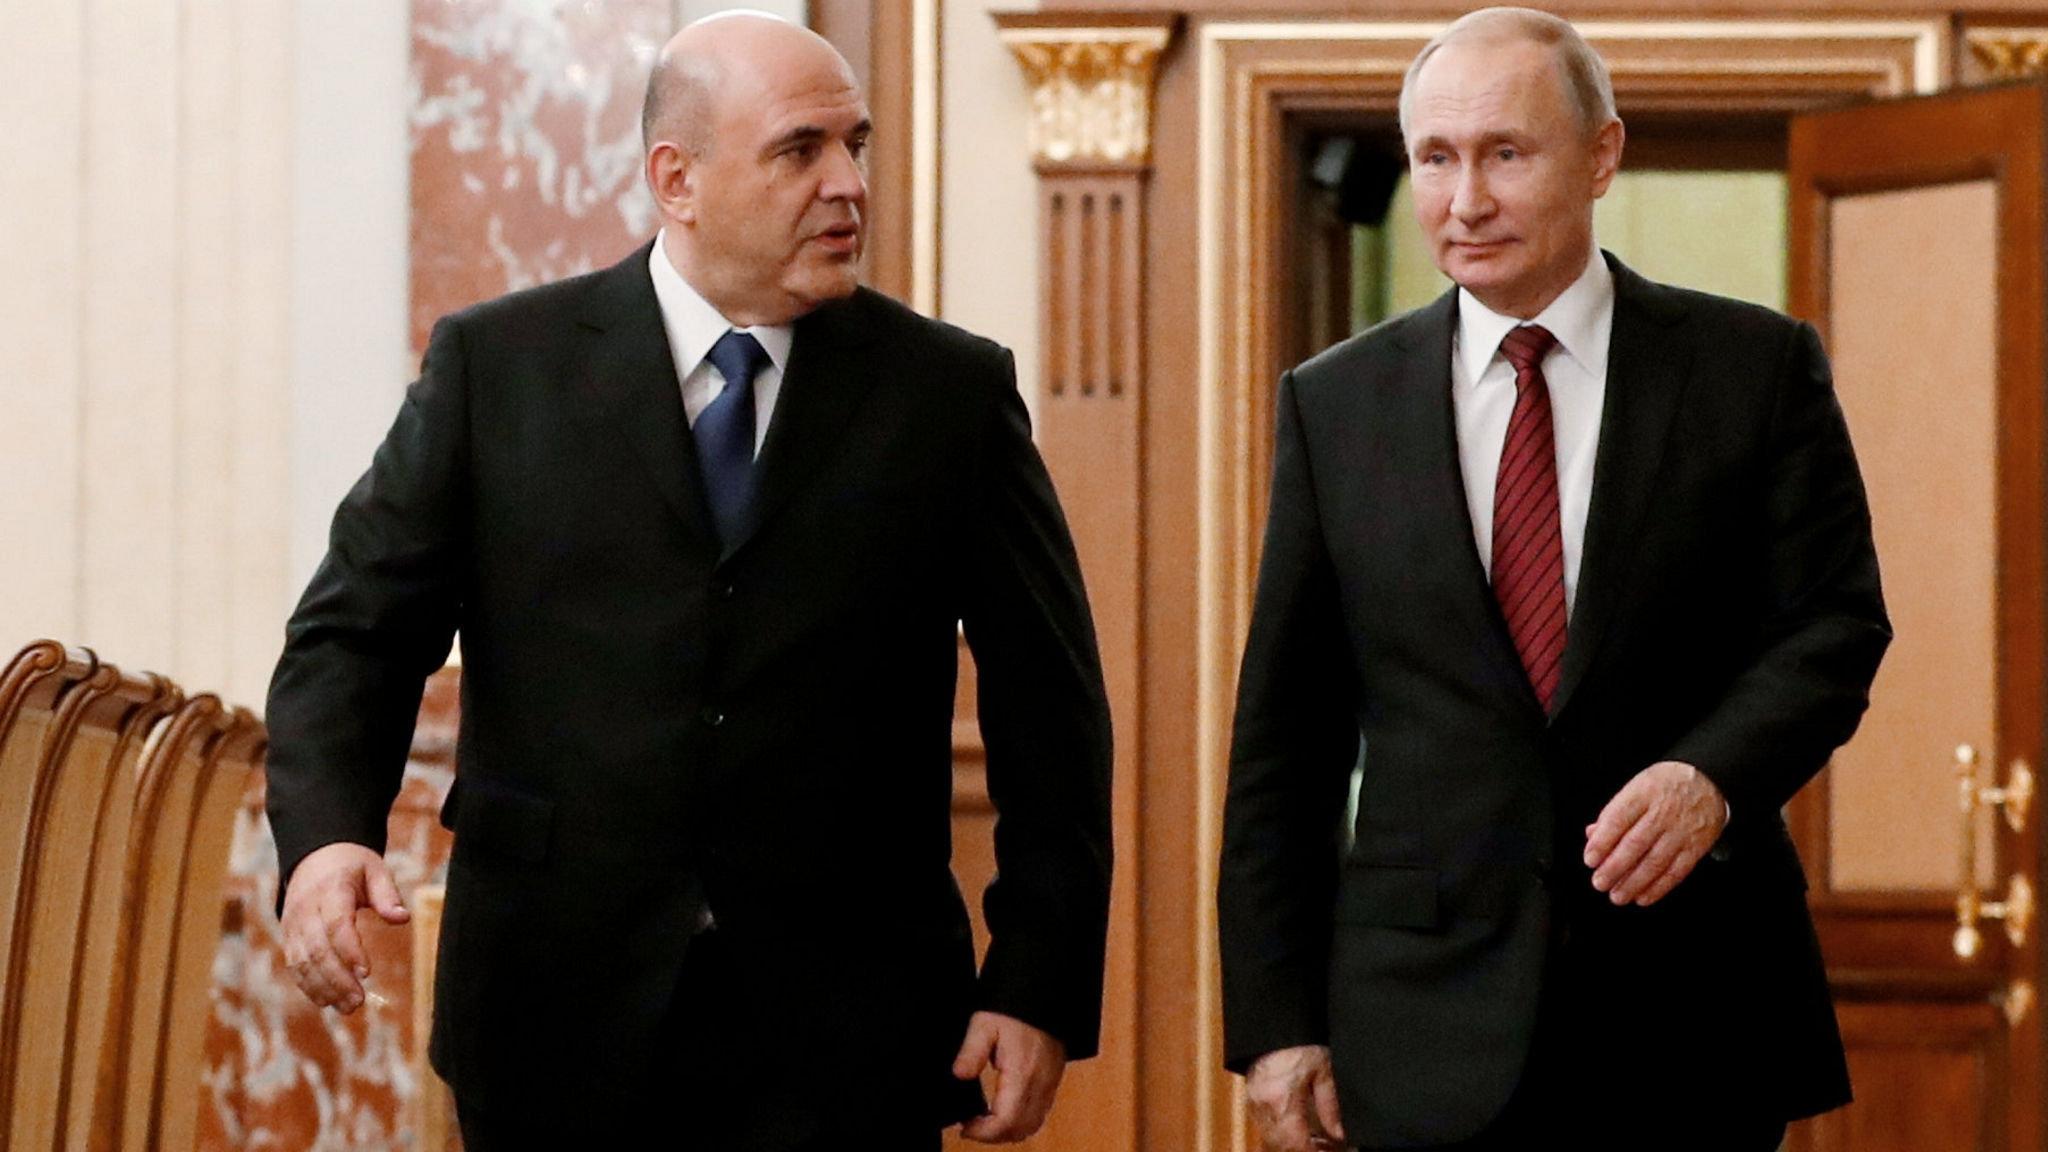 Vladimir Putin Hands New Pm Mandate To Begin Spending Spree Financial Times